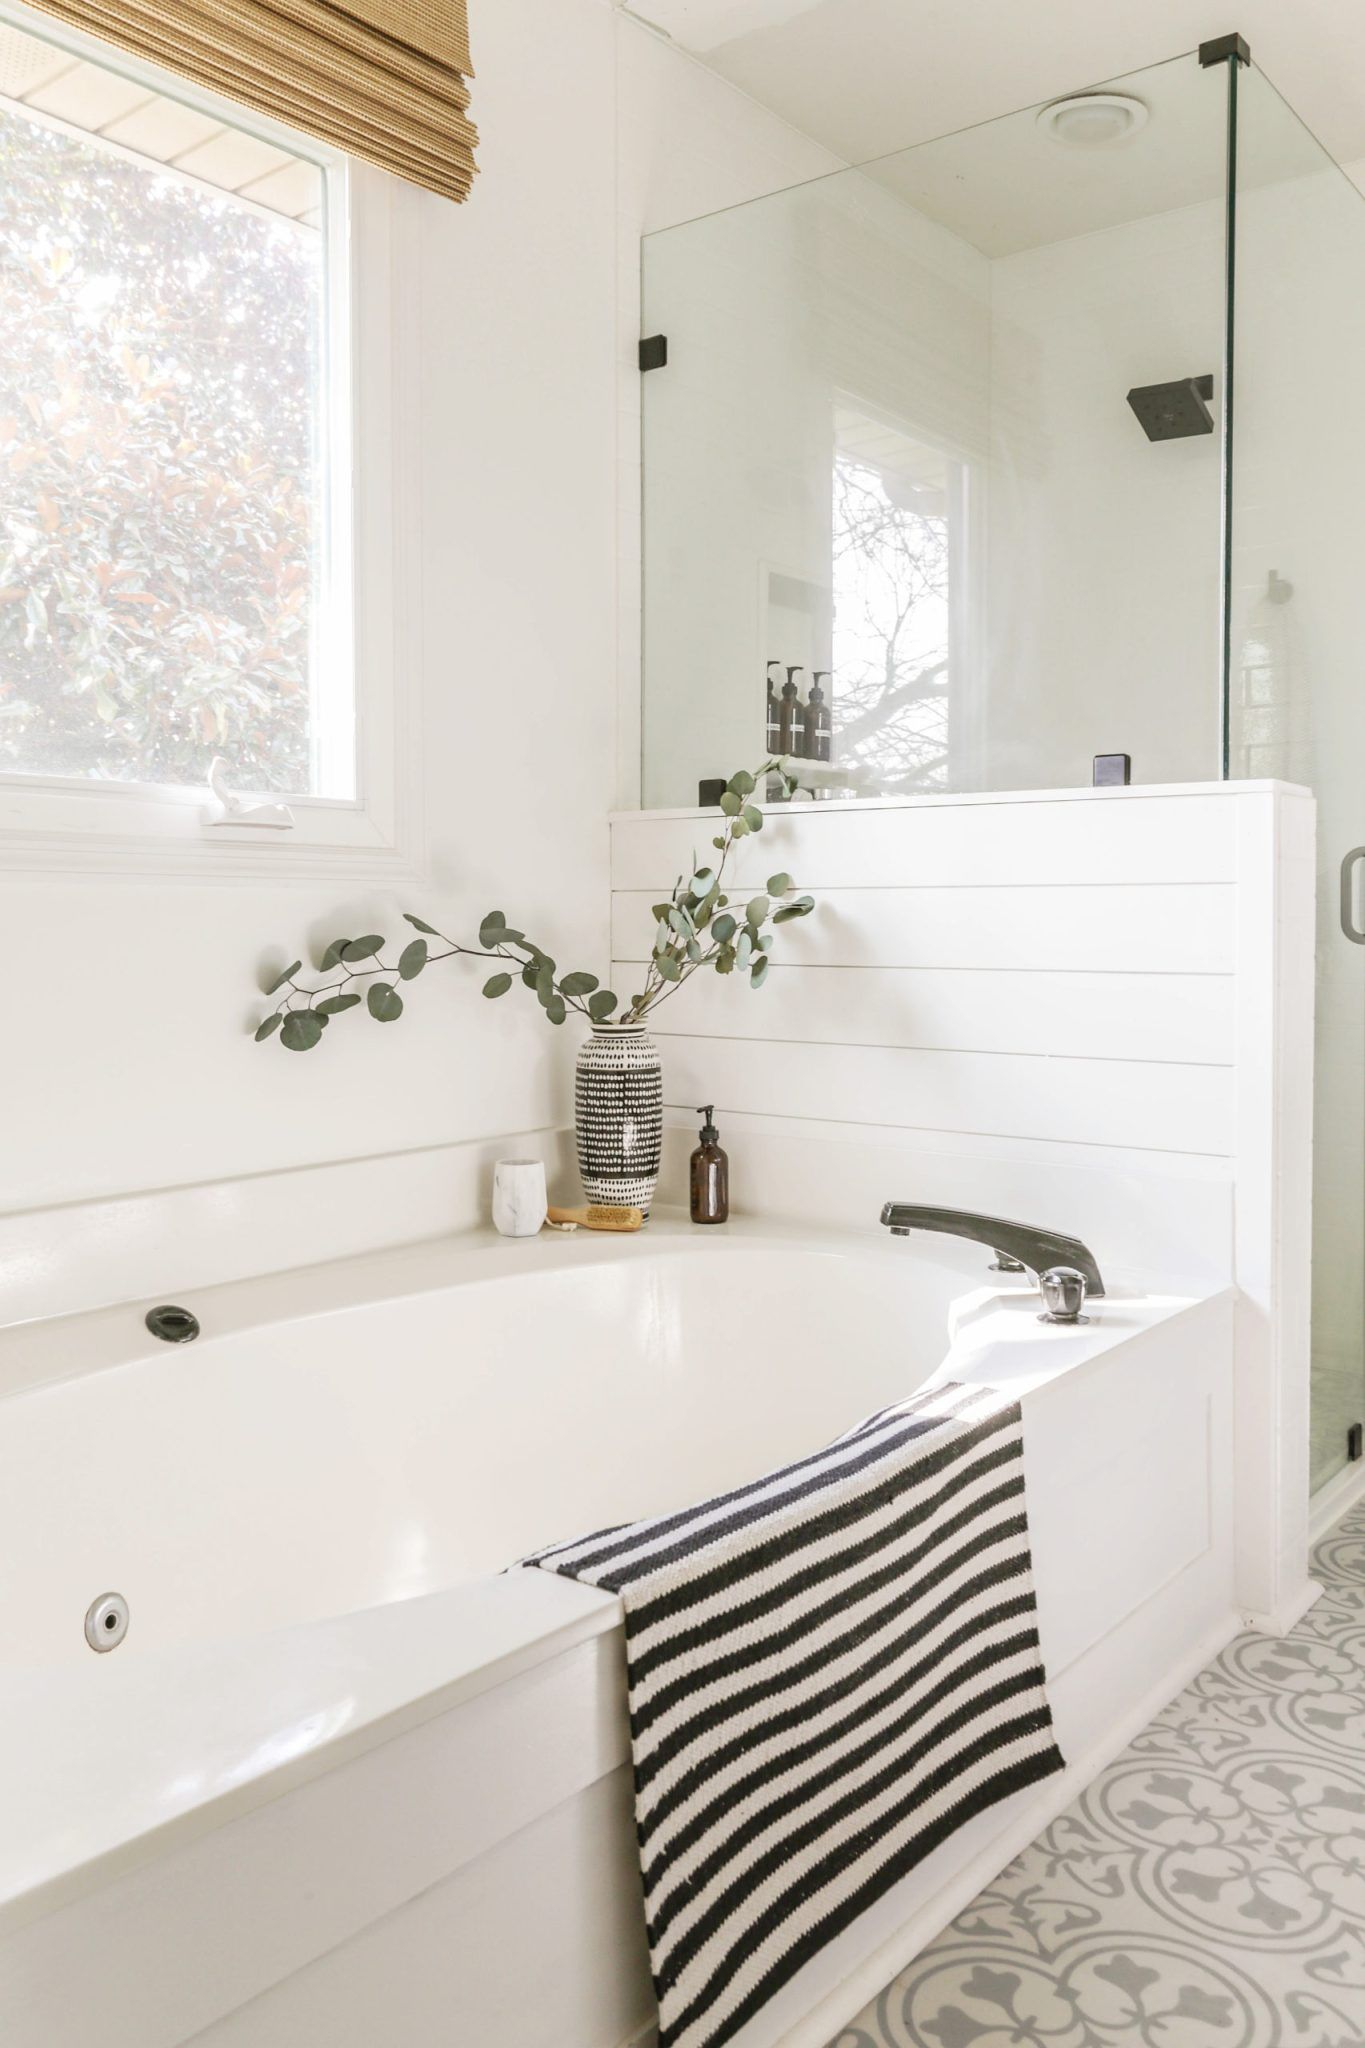 Reveal Boho Farmhouse Master Bathroom Remodel With Decor Sources In 2020 Farmhouse Master Bathroom Bathroom Remodel Master Bathrooms Remodel